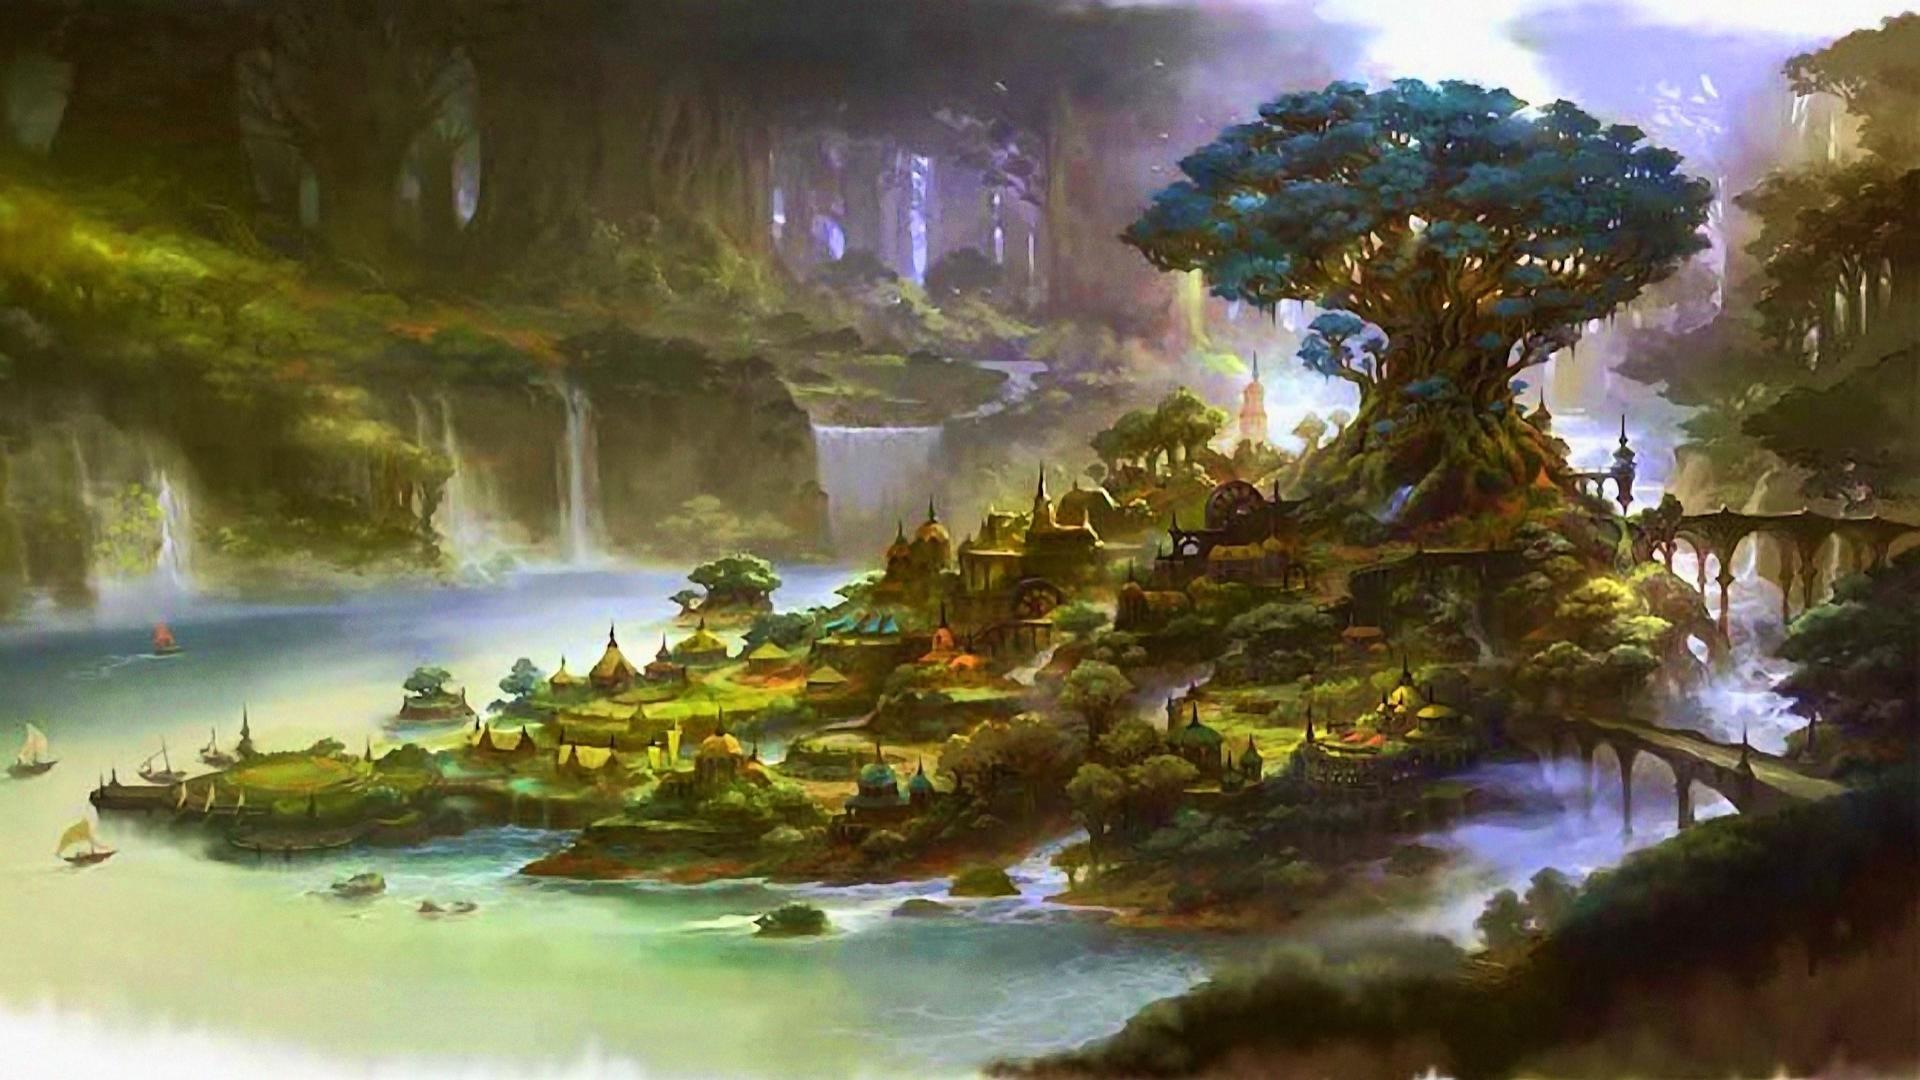 Download Hd 1080p Final Fantasy XIV FF14 Computer Wallpaper ID155883 For Free